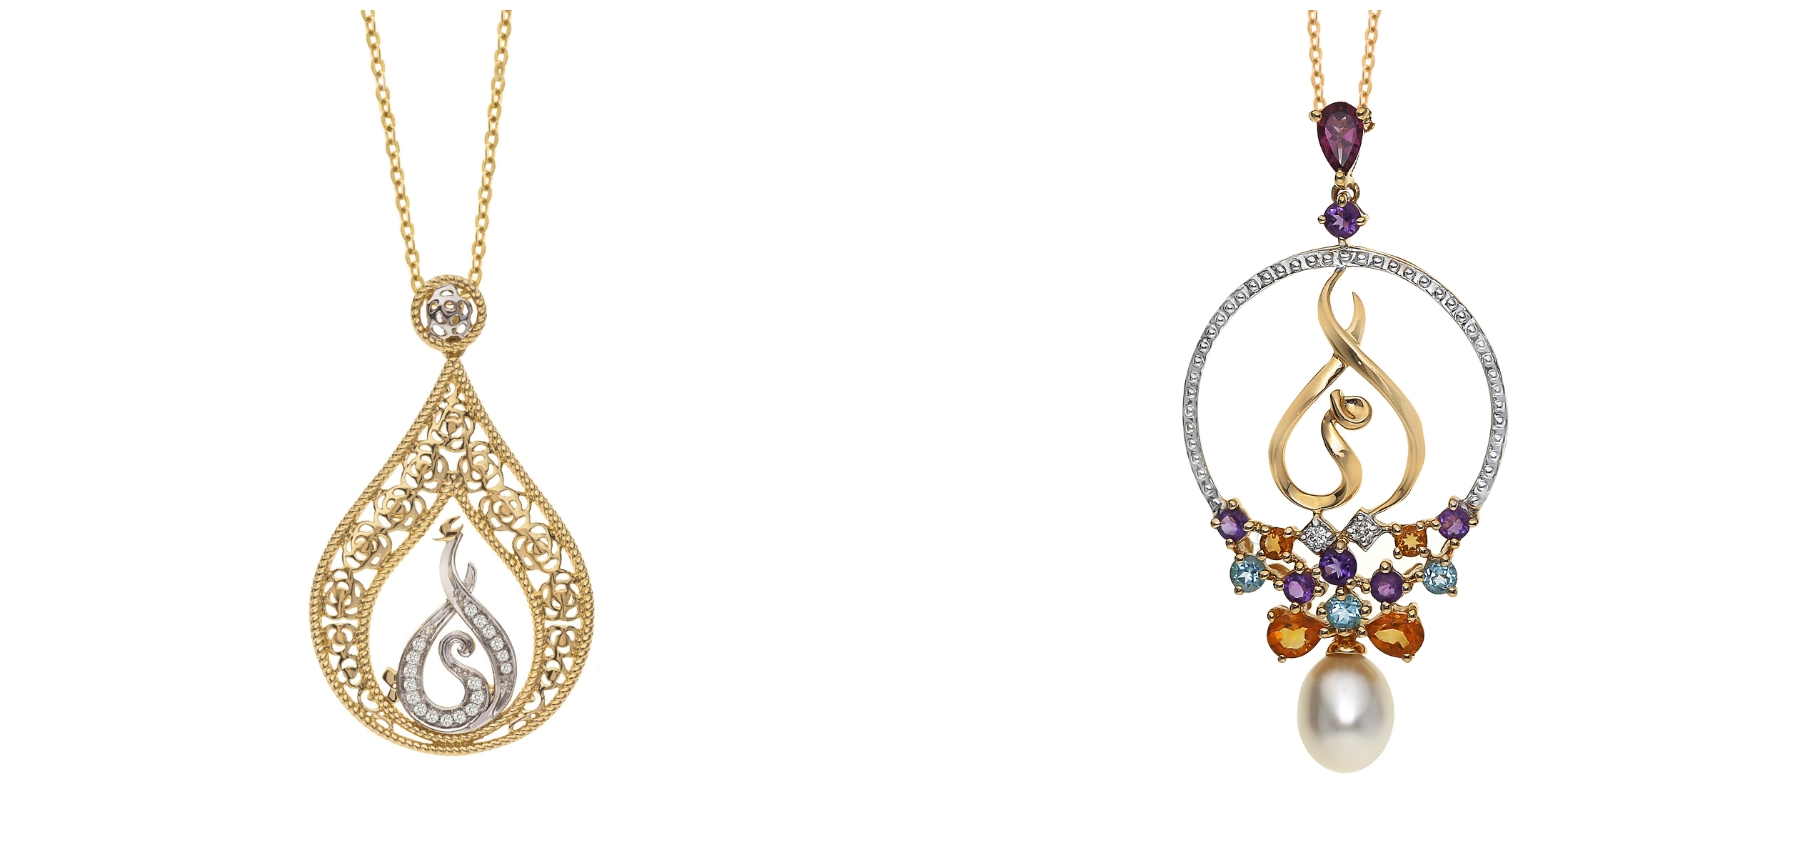 بالصور مجوهرات داماس , اجمل اشكال موديلات داماس 1774 2